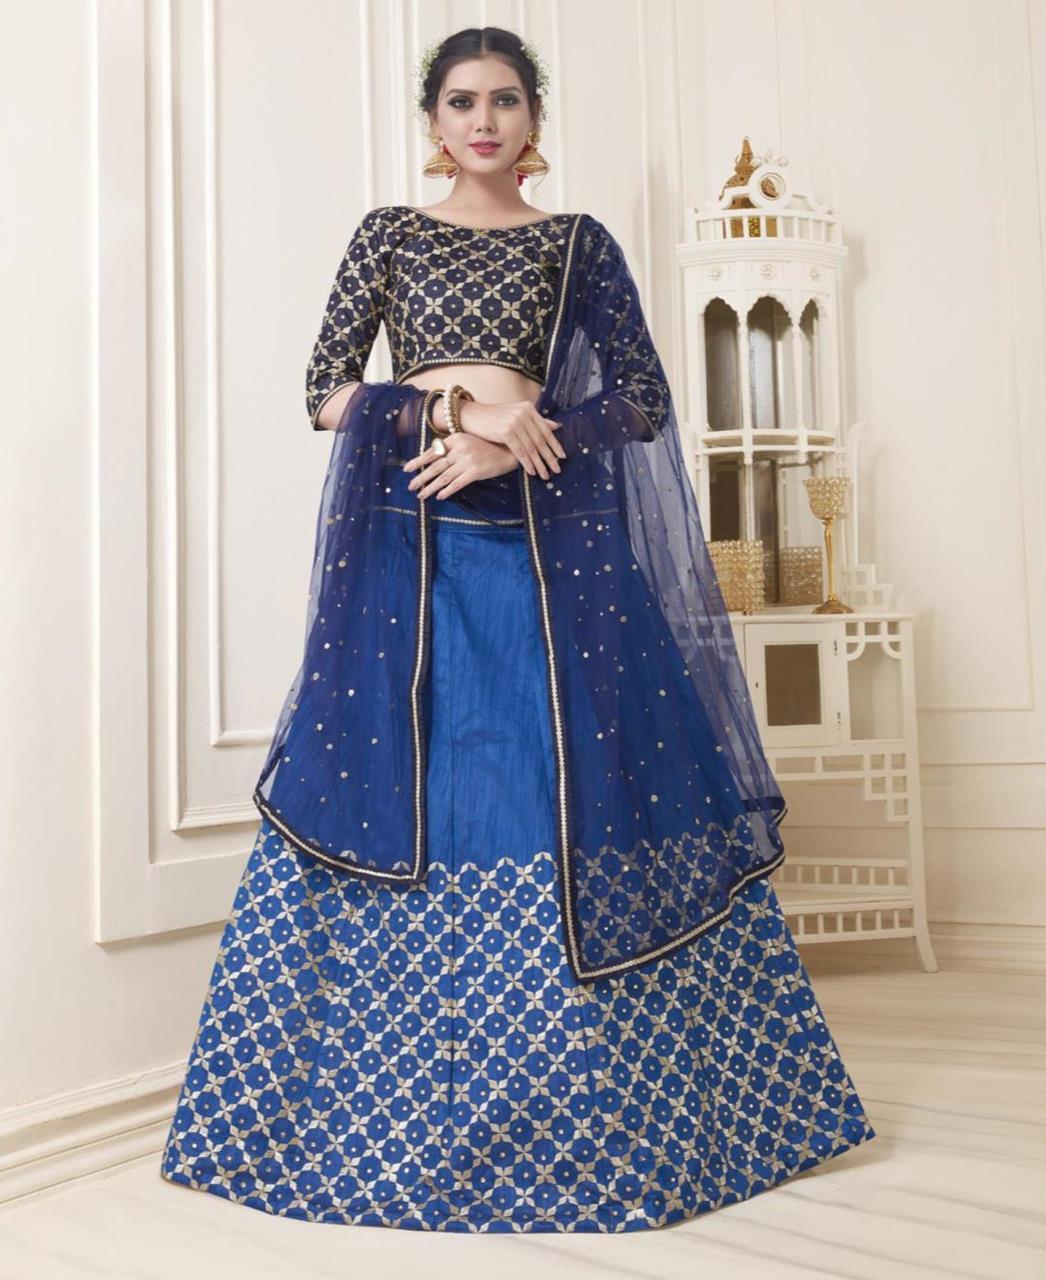 Embroidered Bangalore Silk Blue Circular Lehenga Choli